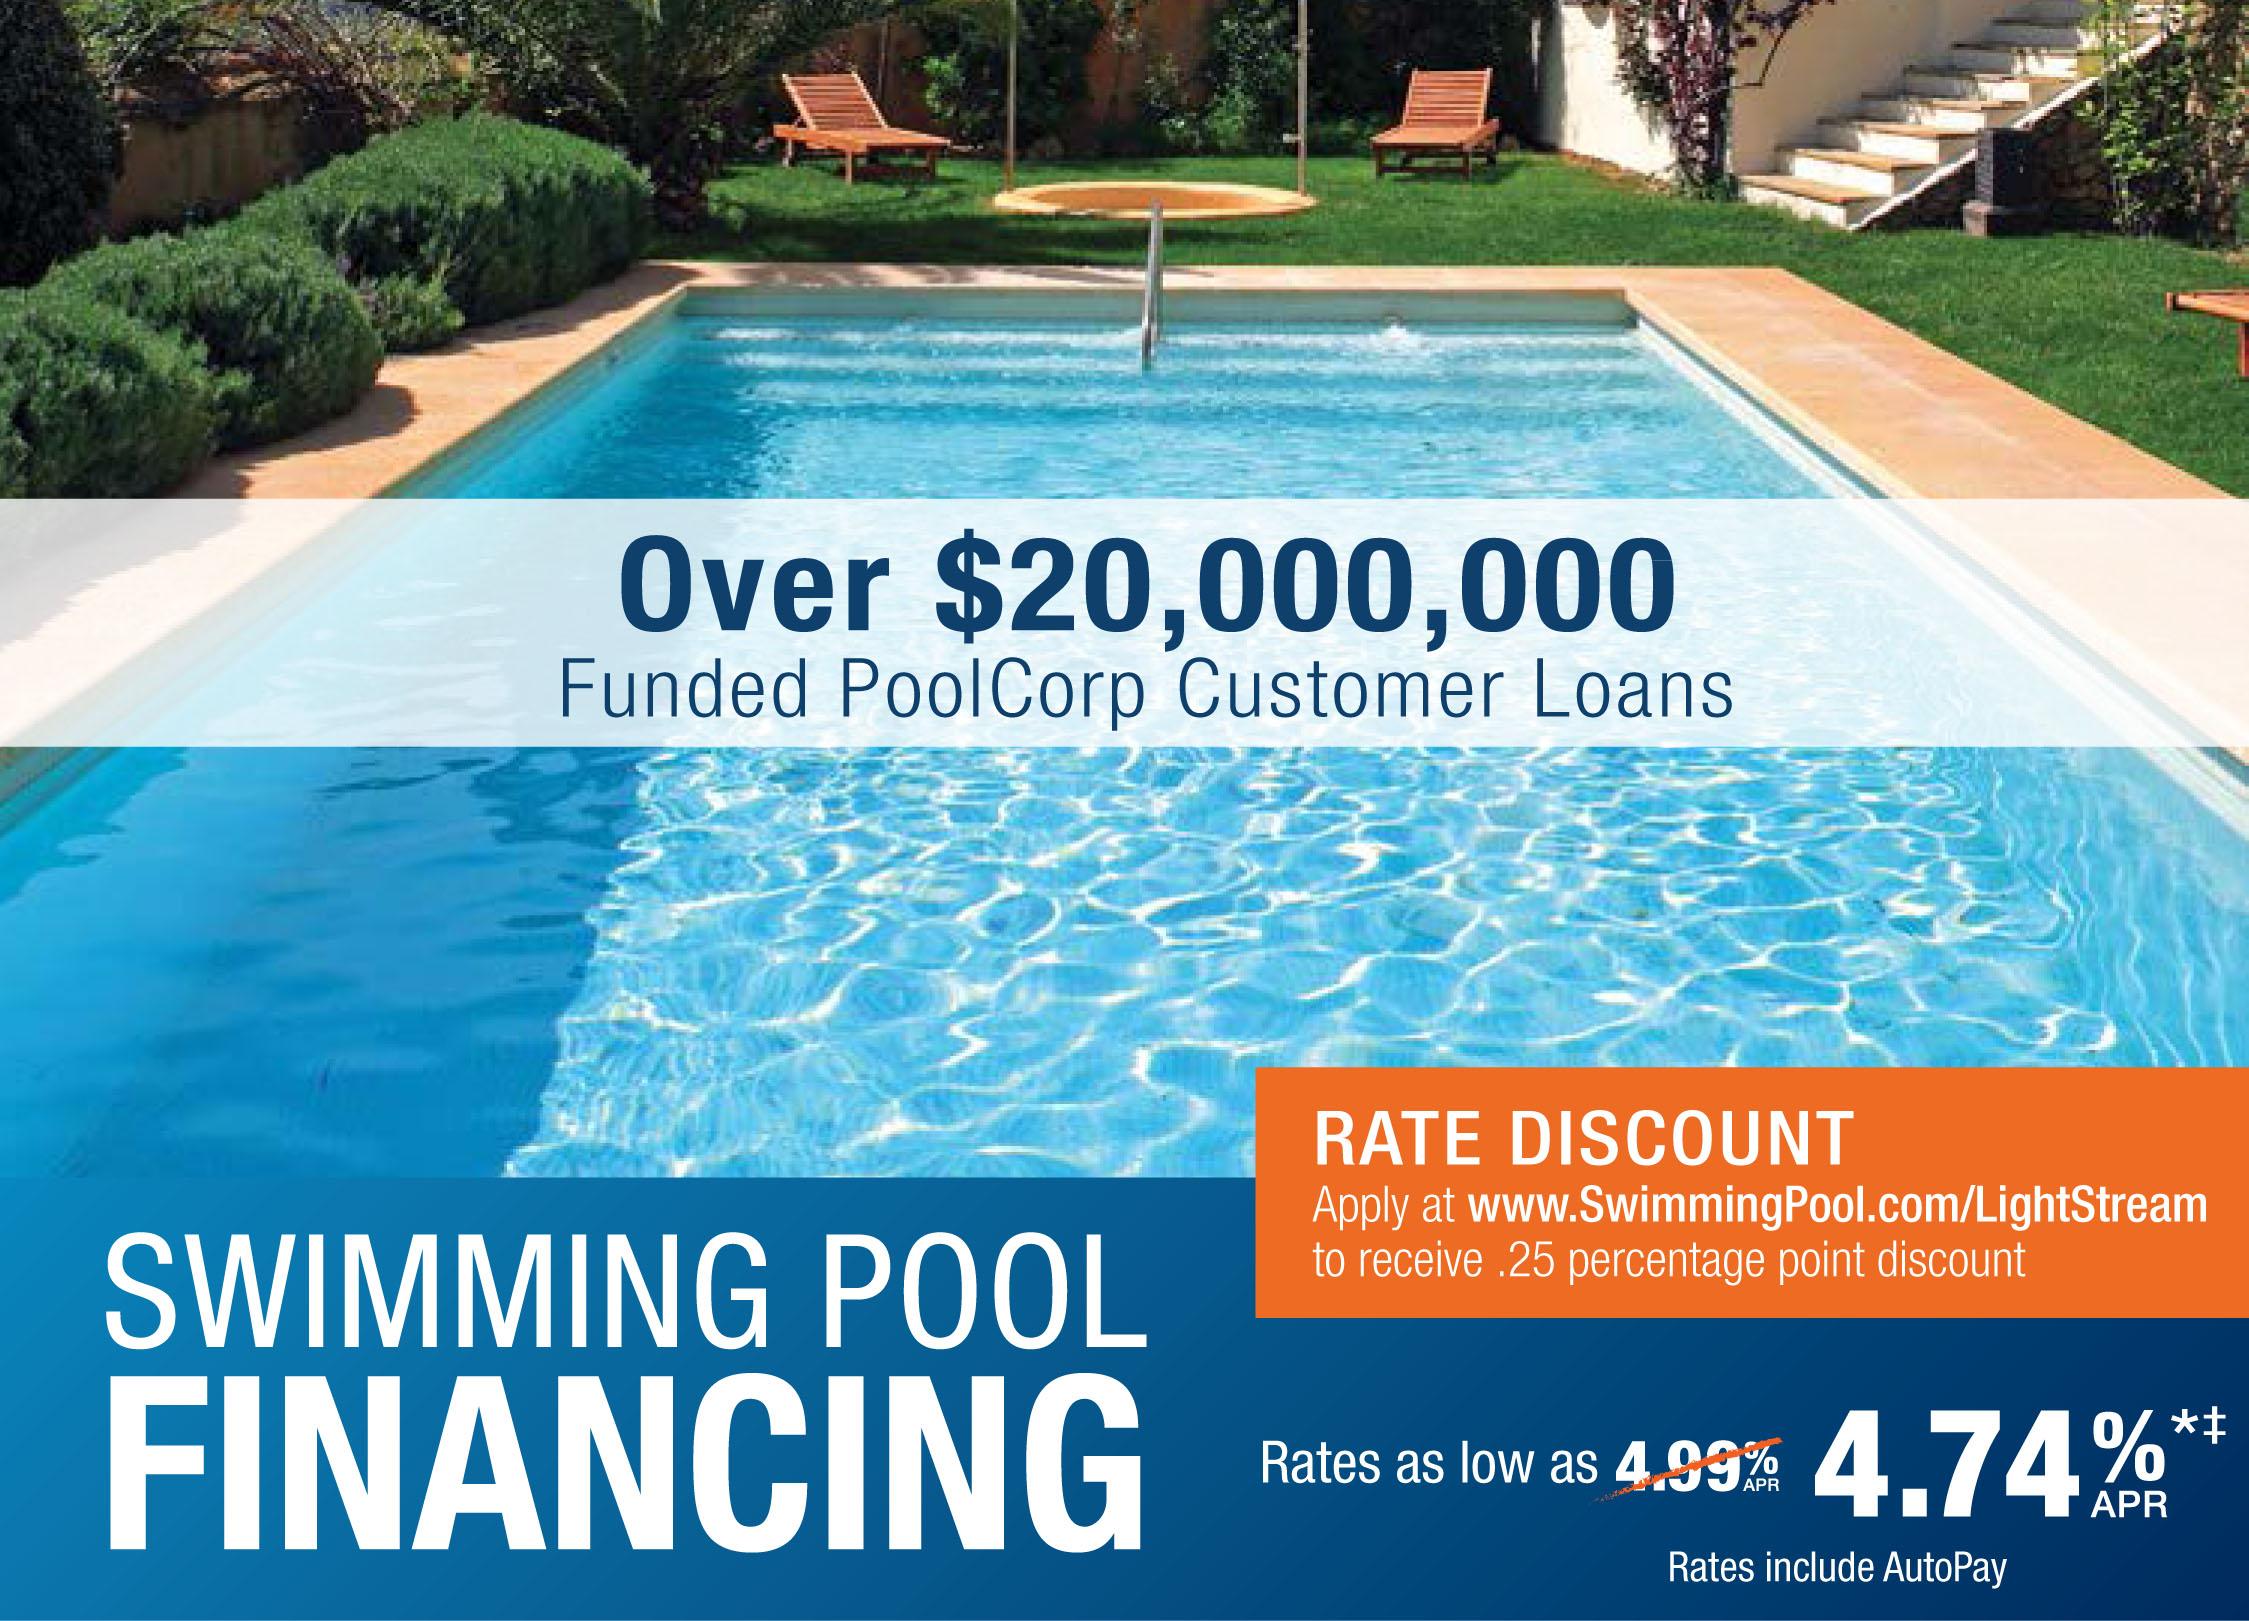 Swimming Pool Financing